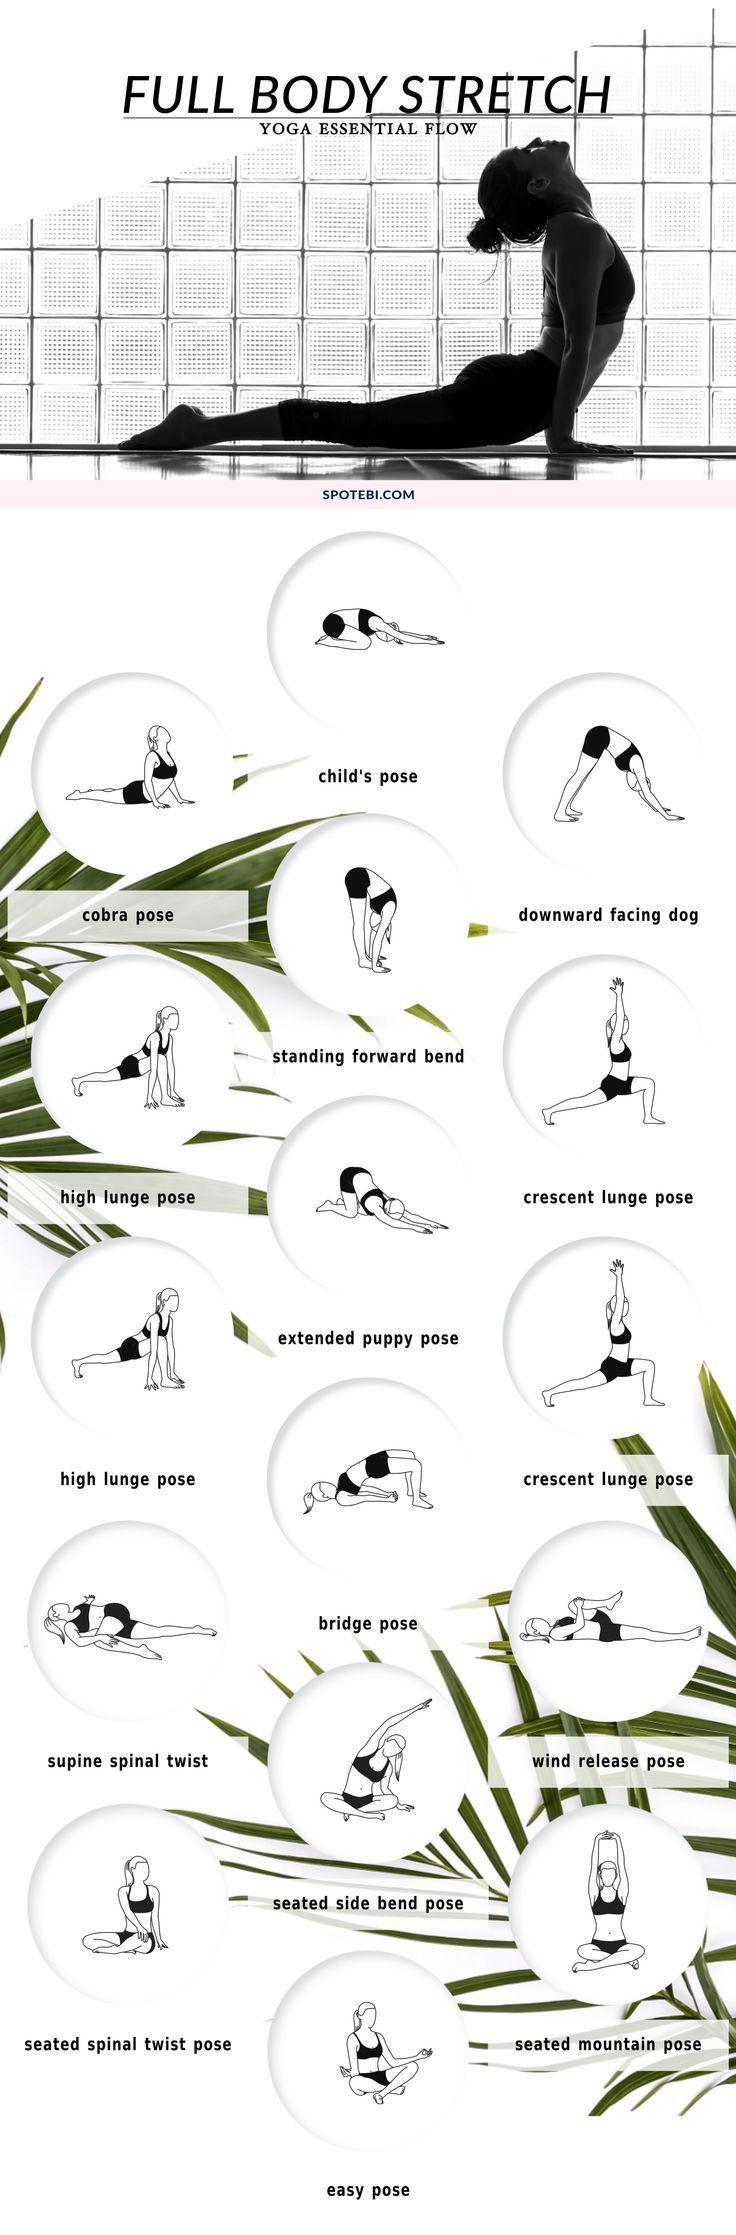 Full Body Stretch | Yoga Essential Flow -  Improve your range of motion, increase circulation, and calm your mind with this 10 minute full bod - #asana #Body #essential #Exercise #Flow #Full #Meditation #namaste #stretch #VinyasaYoga #YinYoga #Yoga #YogaFitness #YogaFlow #Yogagirls #YogaLifestyle #Yogaposes #YogaSequences